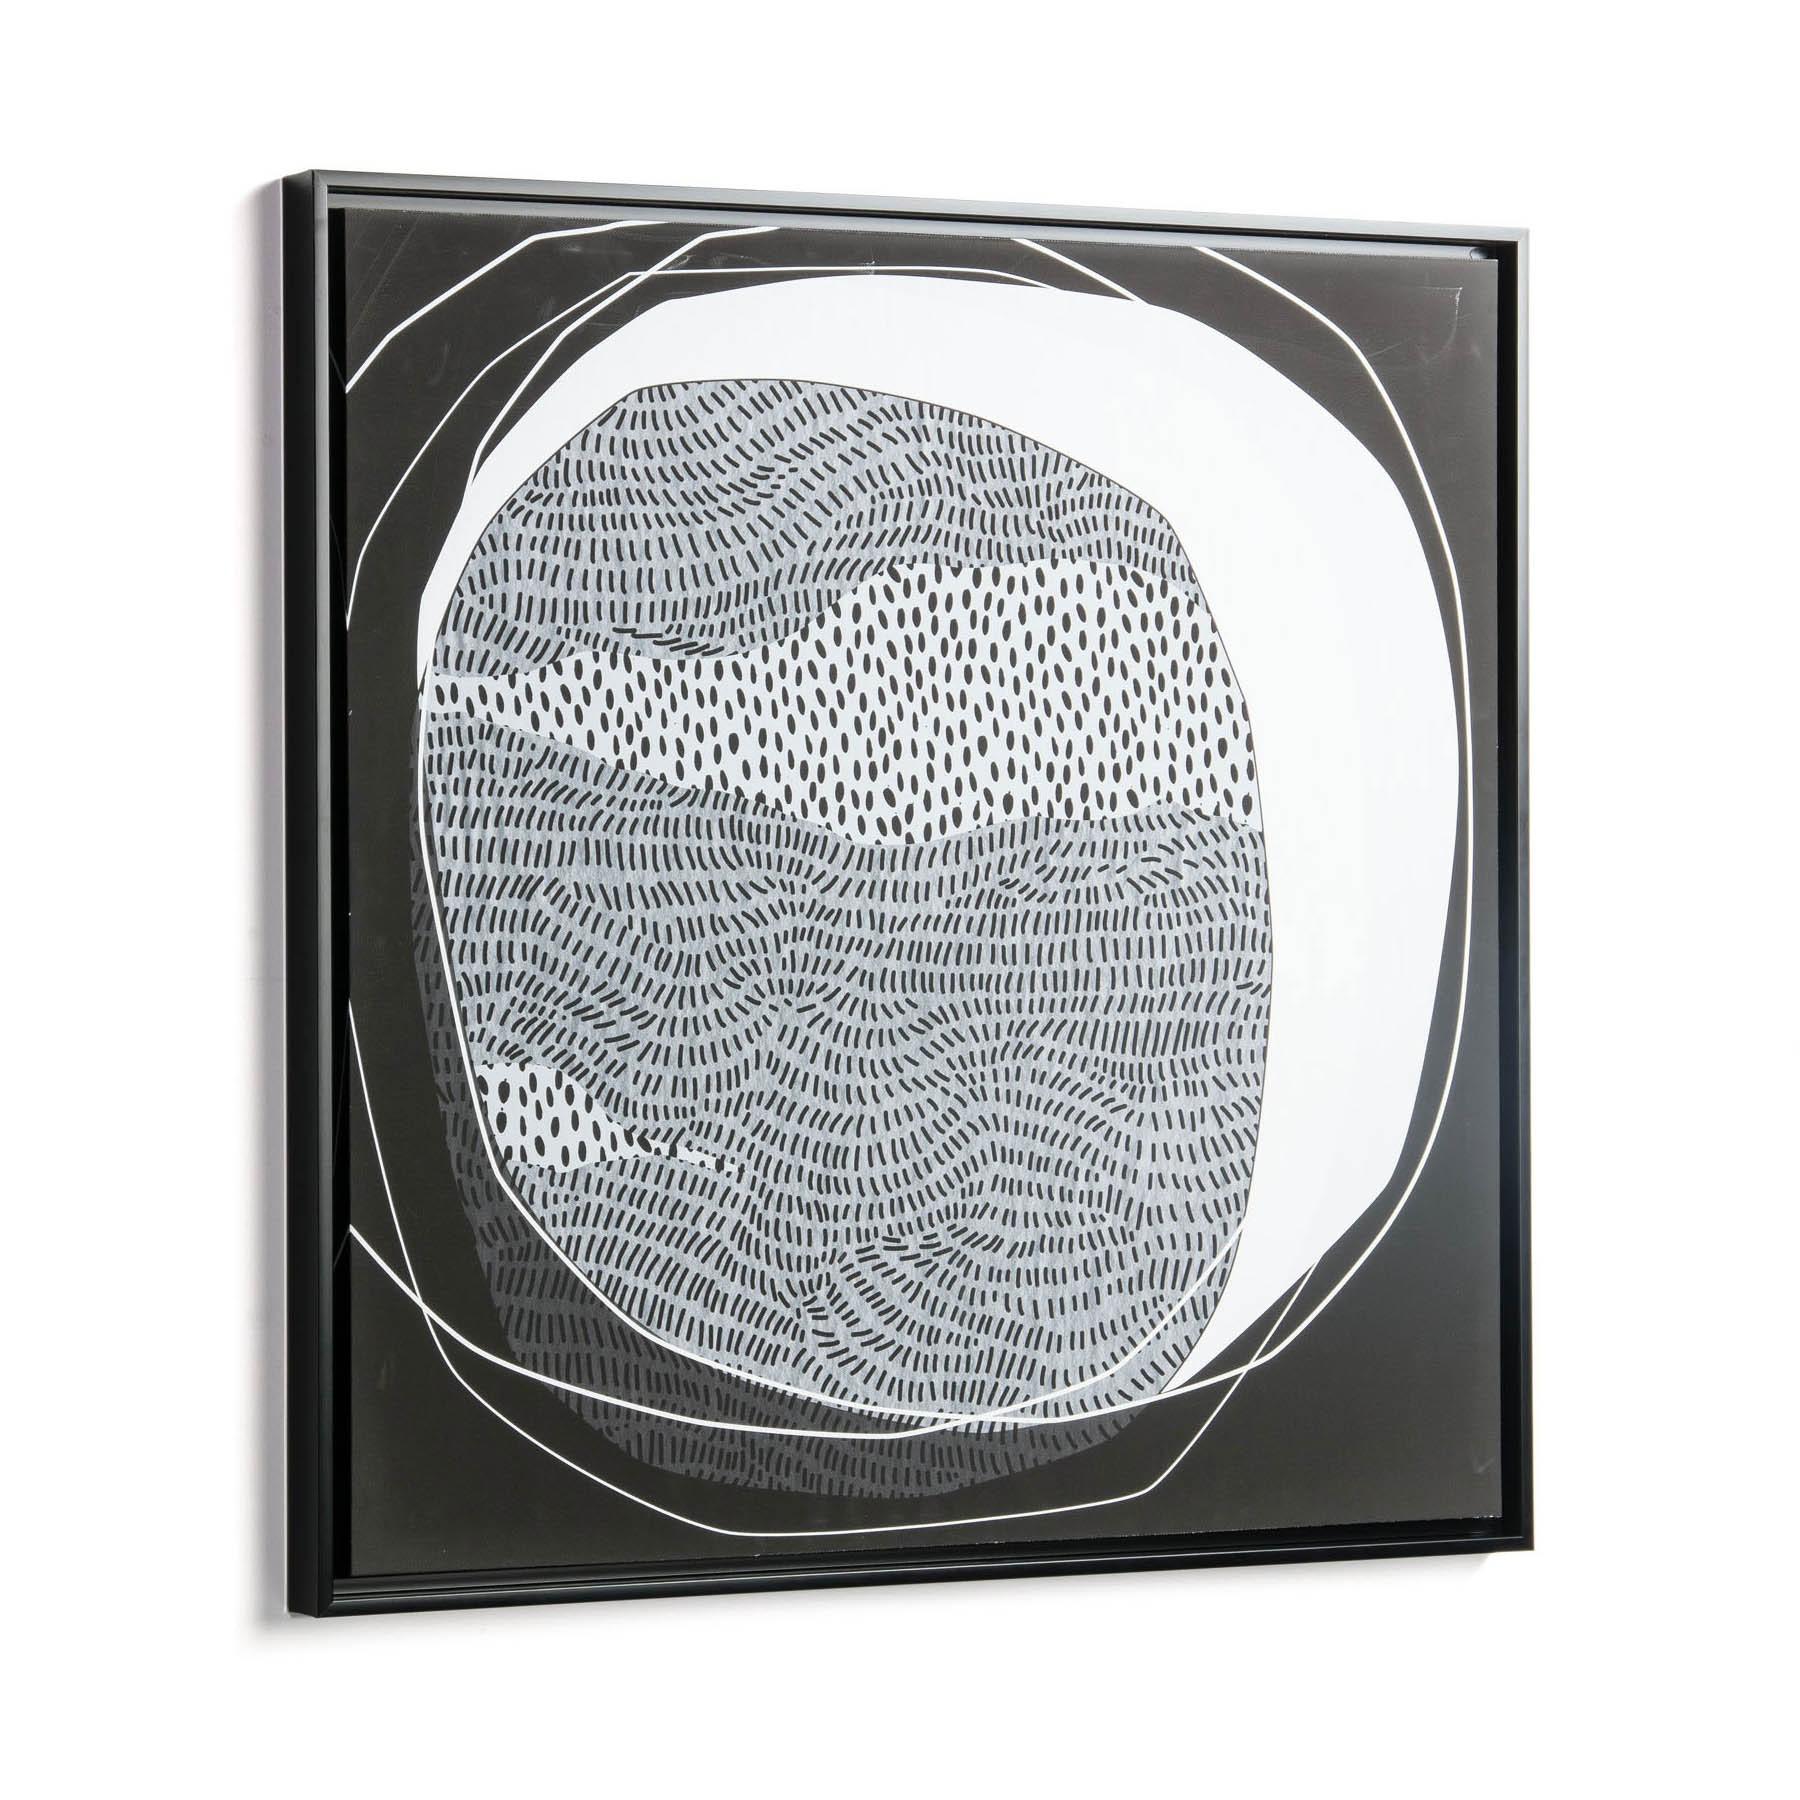 Wakamiya Framed Abstract Canvas Wall Art Print, 60cm